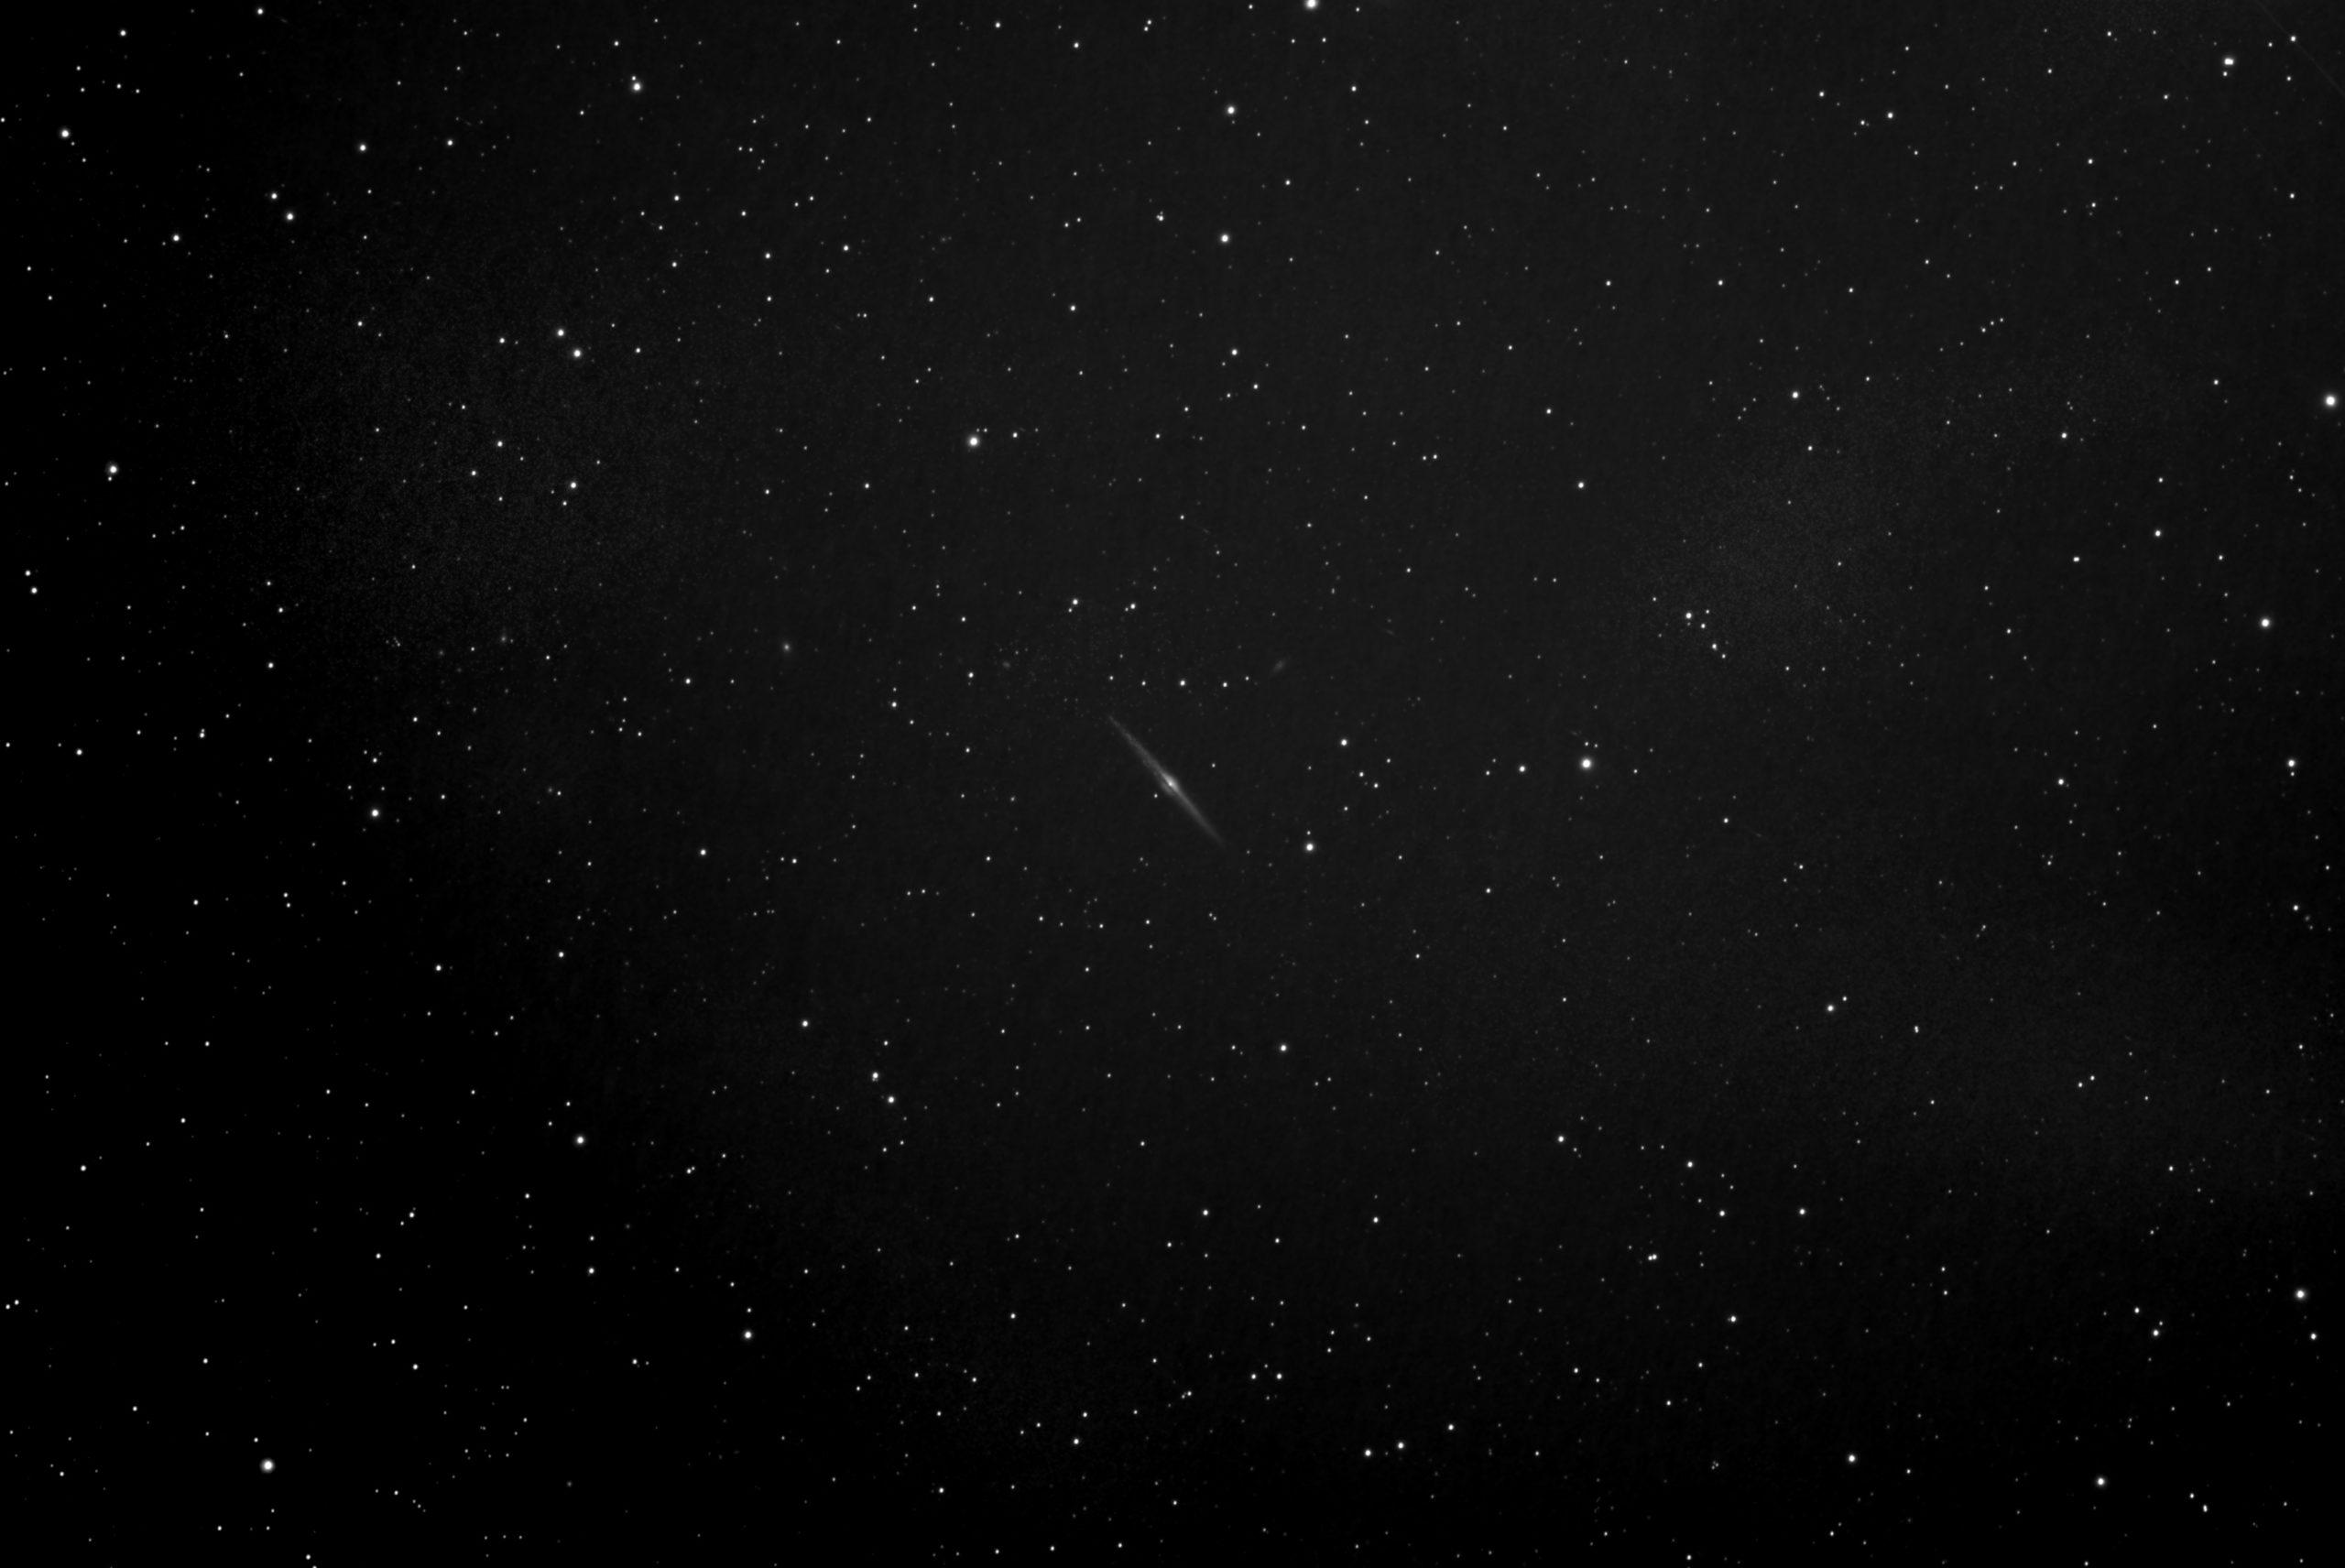 NGC 4565 9 exposure integration